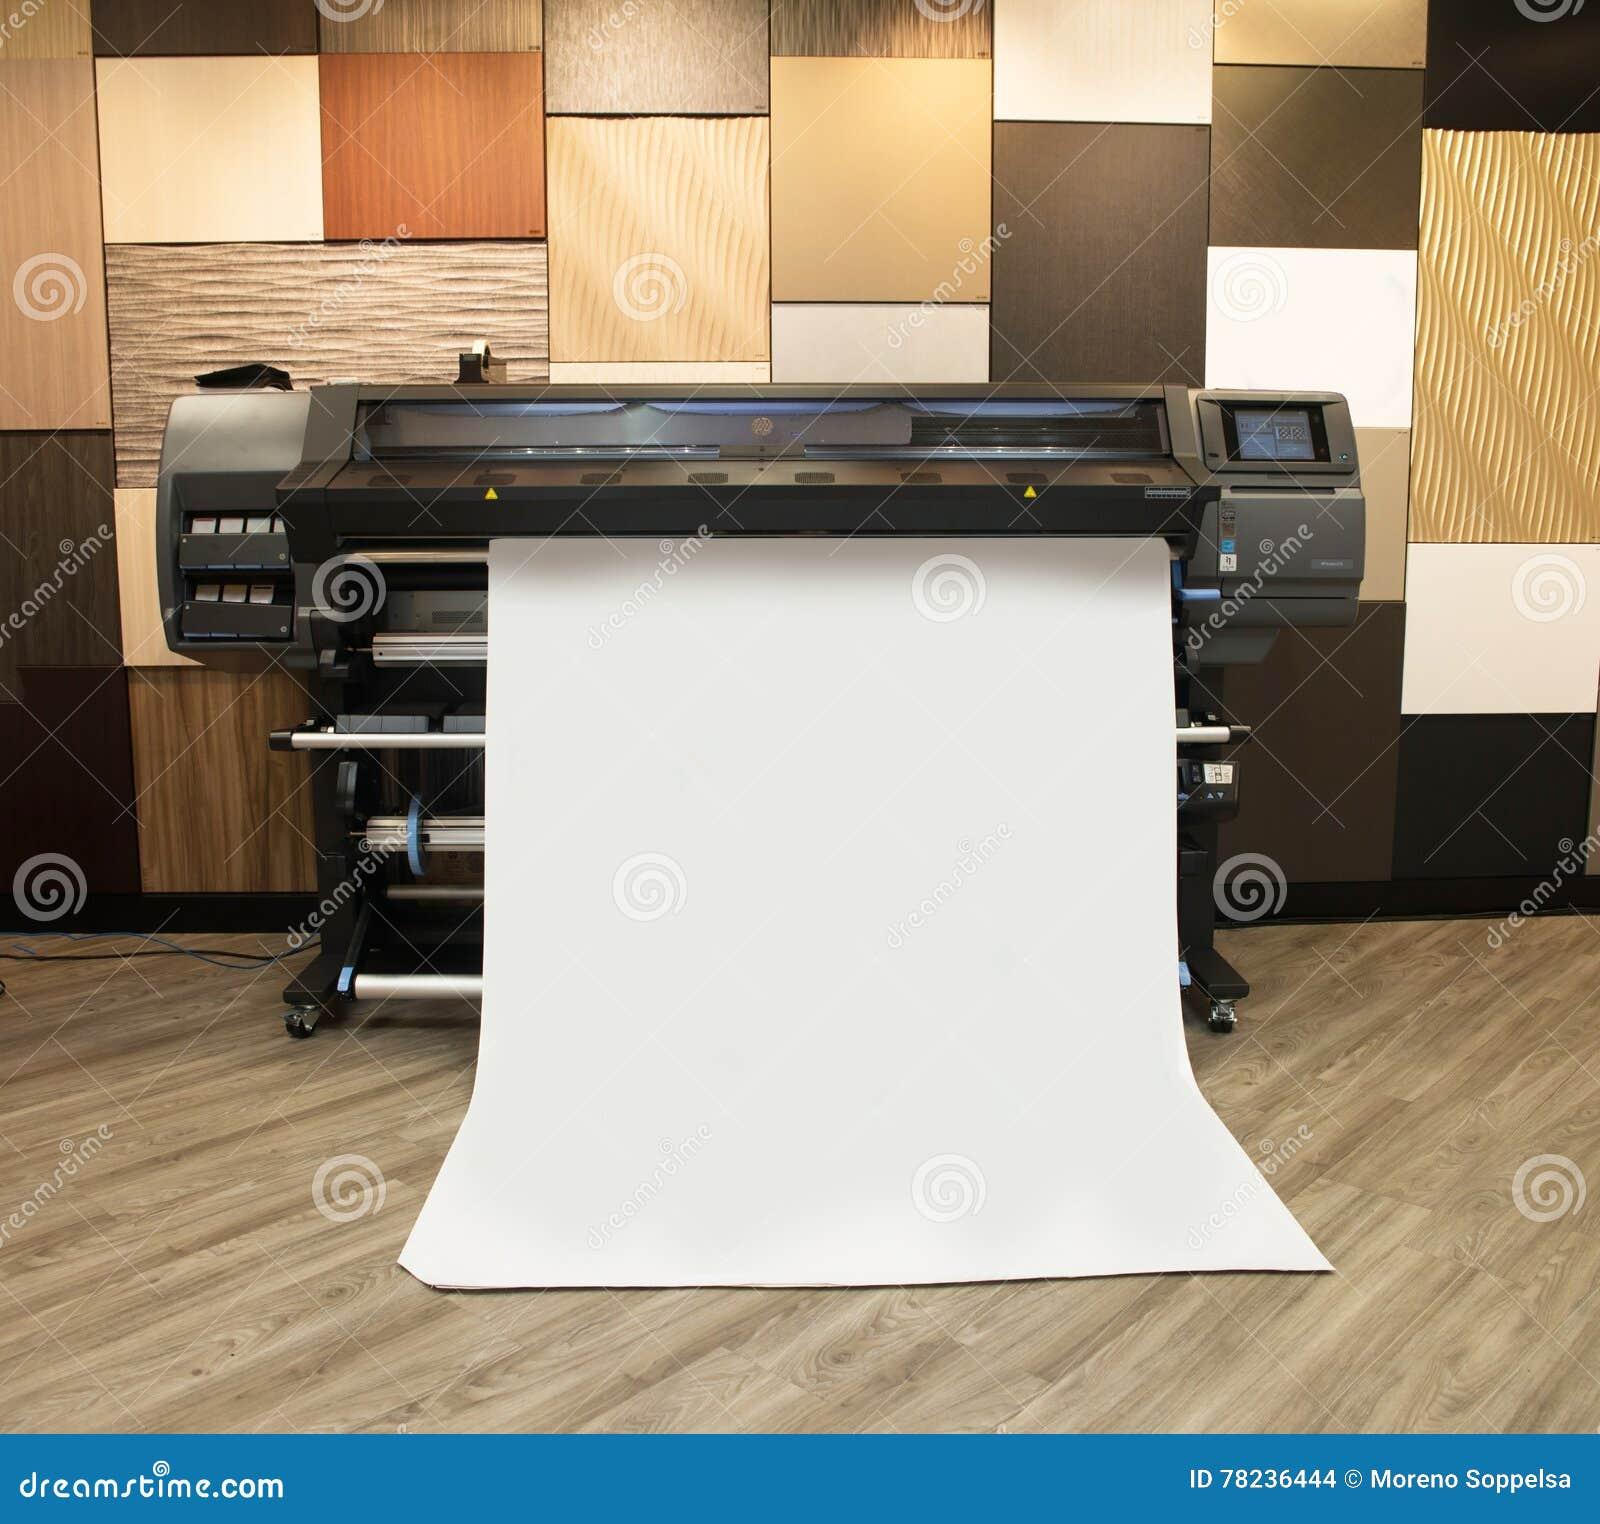 Cyfrowy formata drukarki druk szeroki